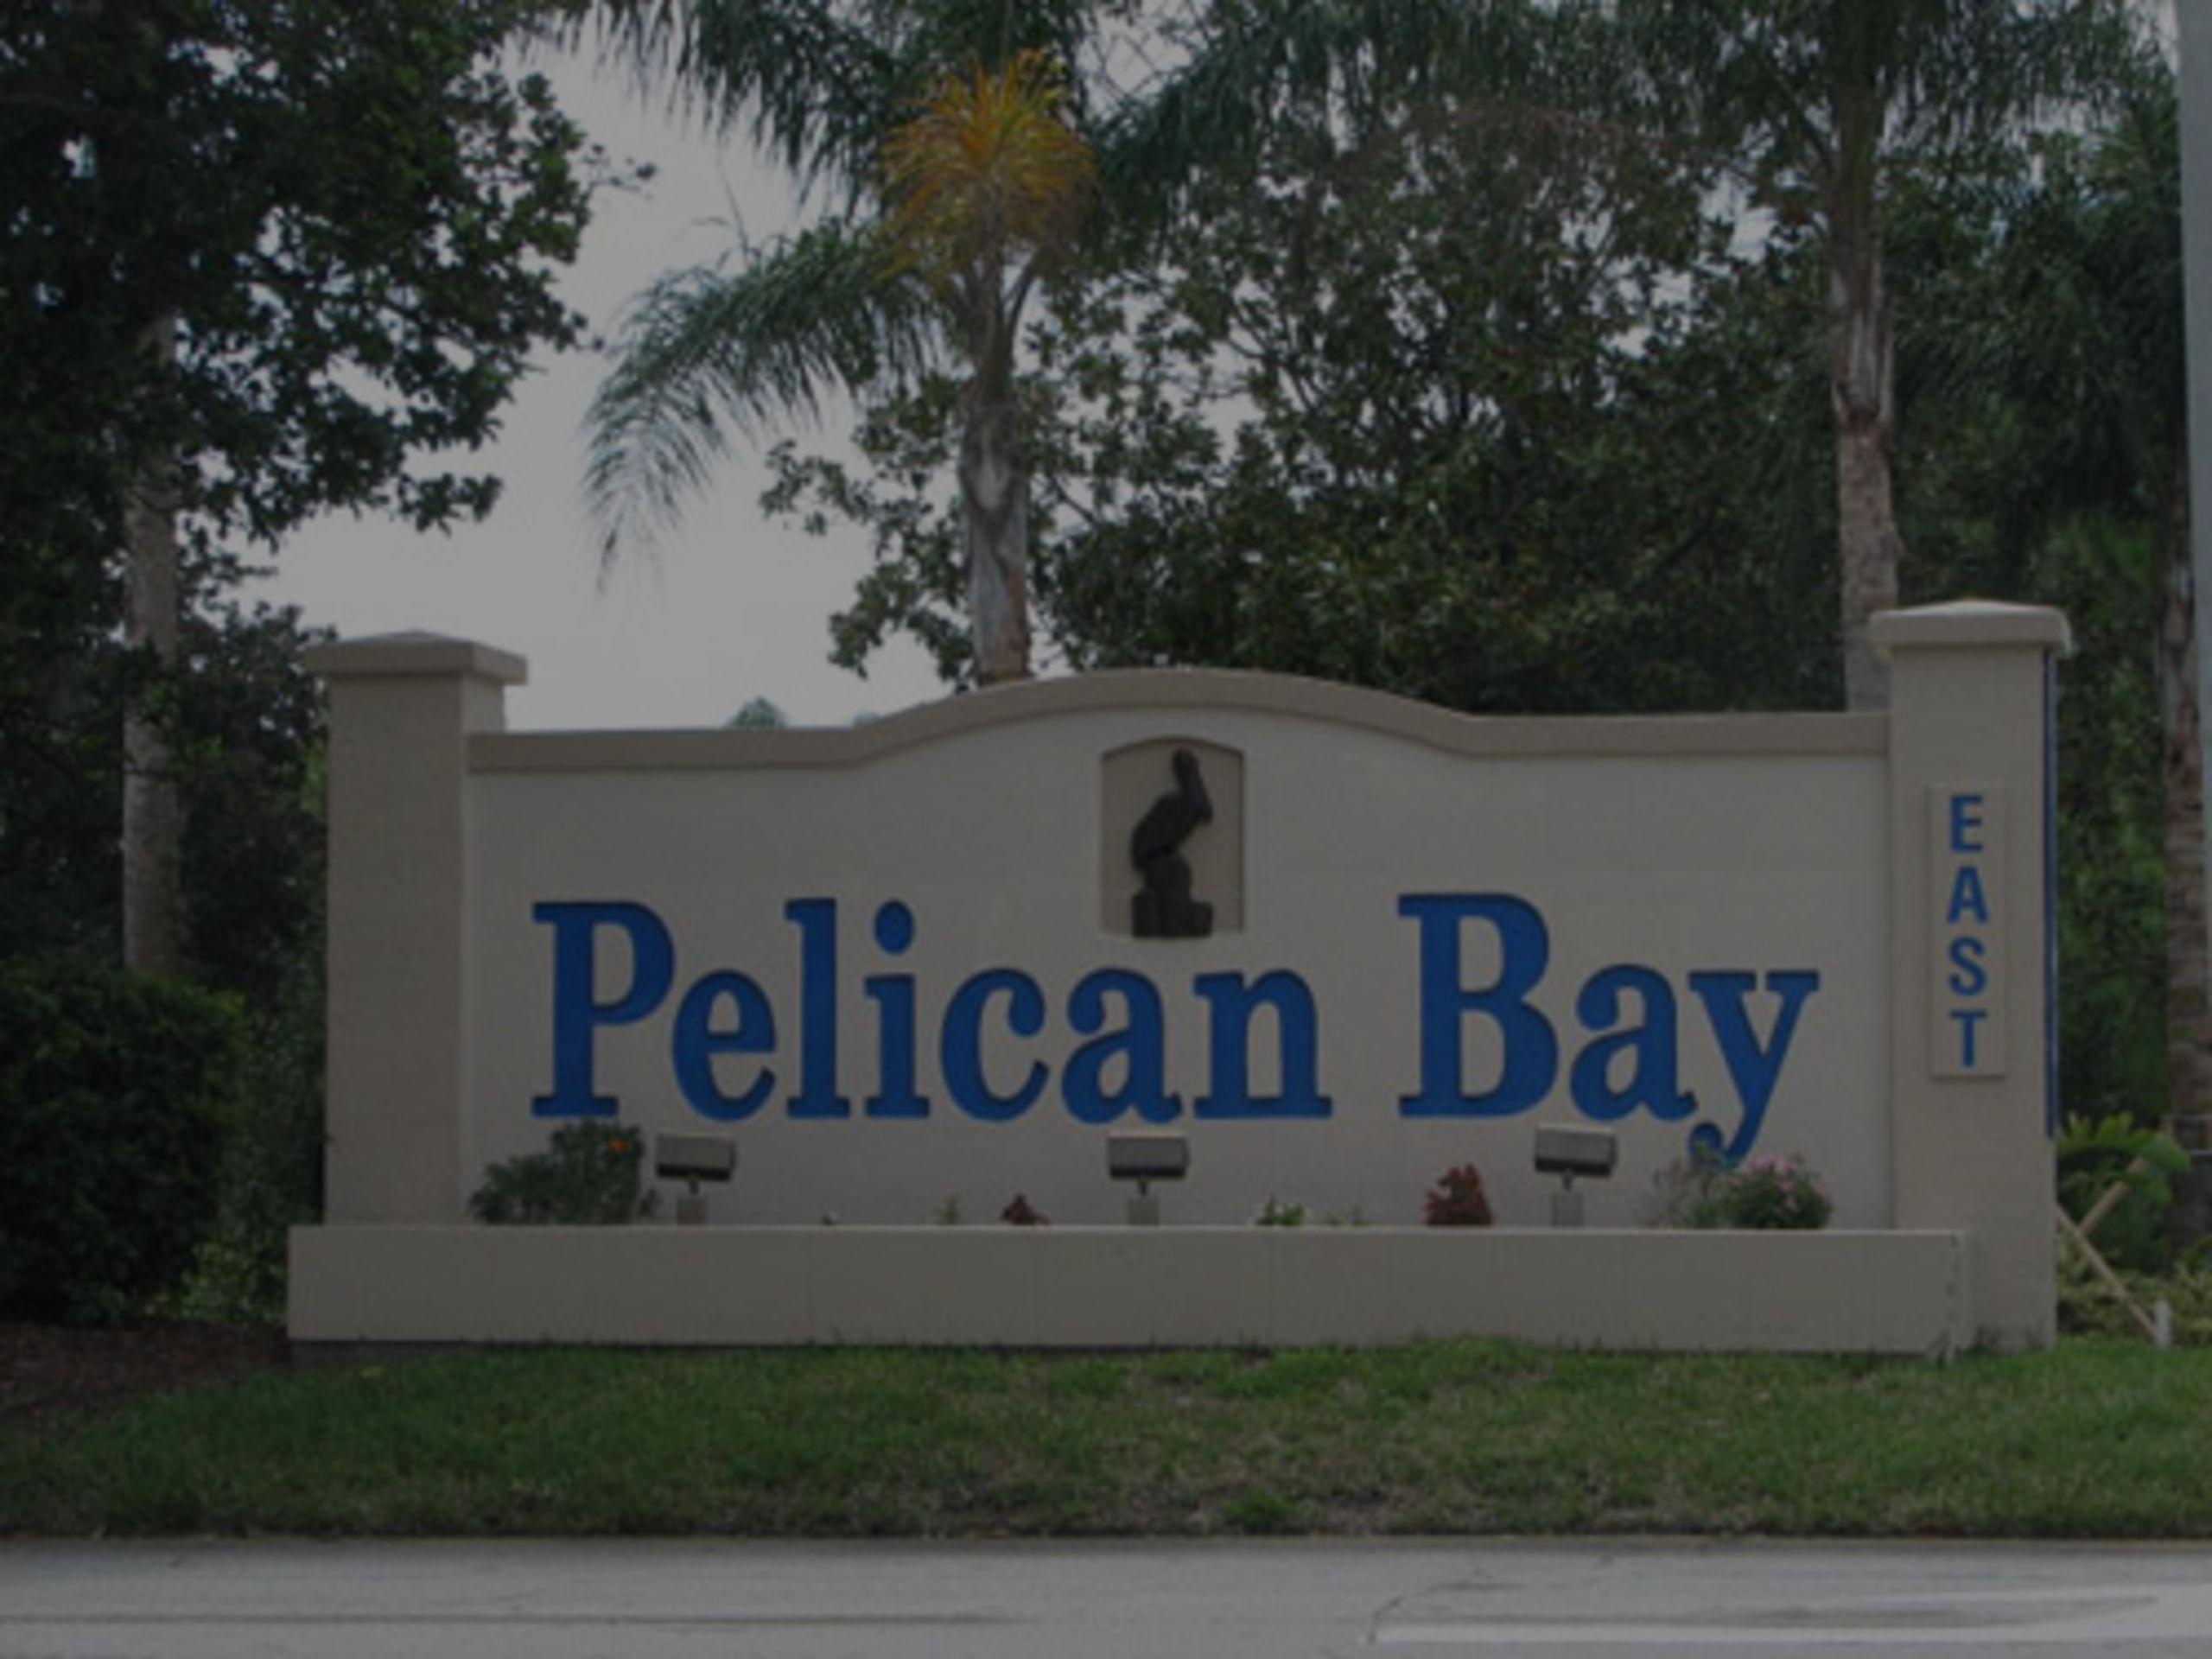 Pelican Bay – Golf Course Community in Daytona Beach